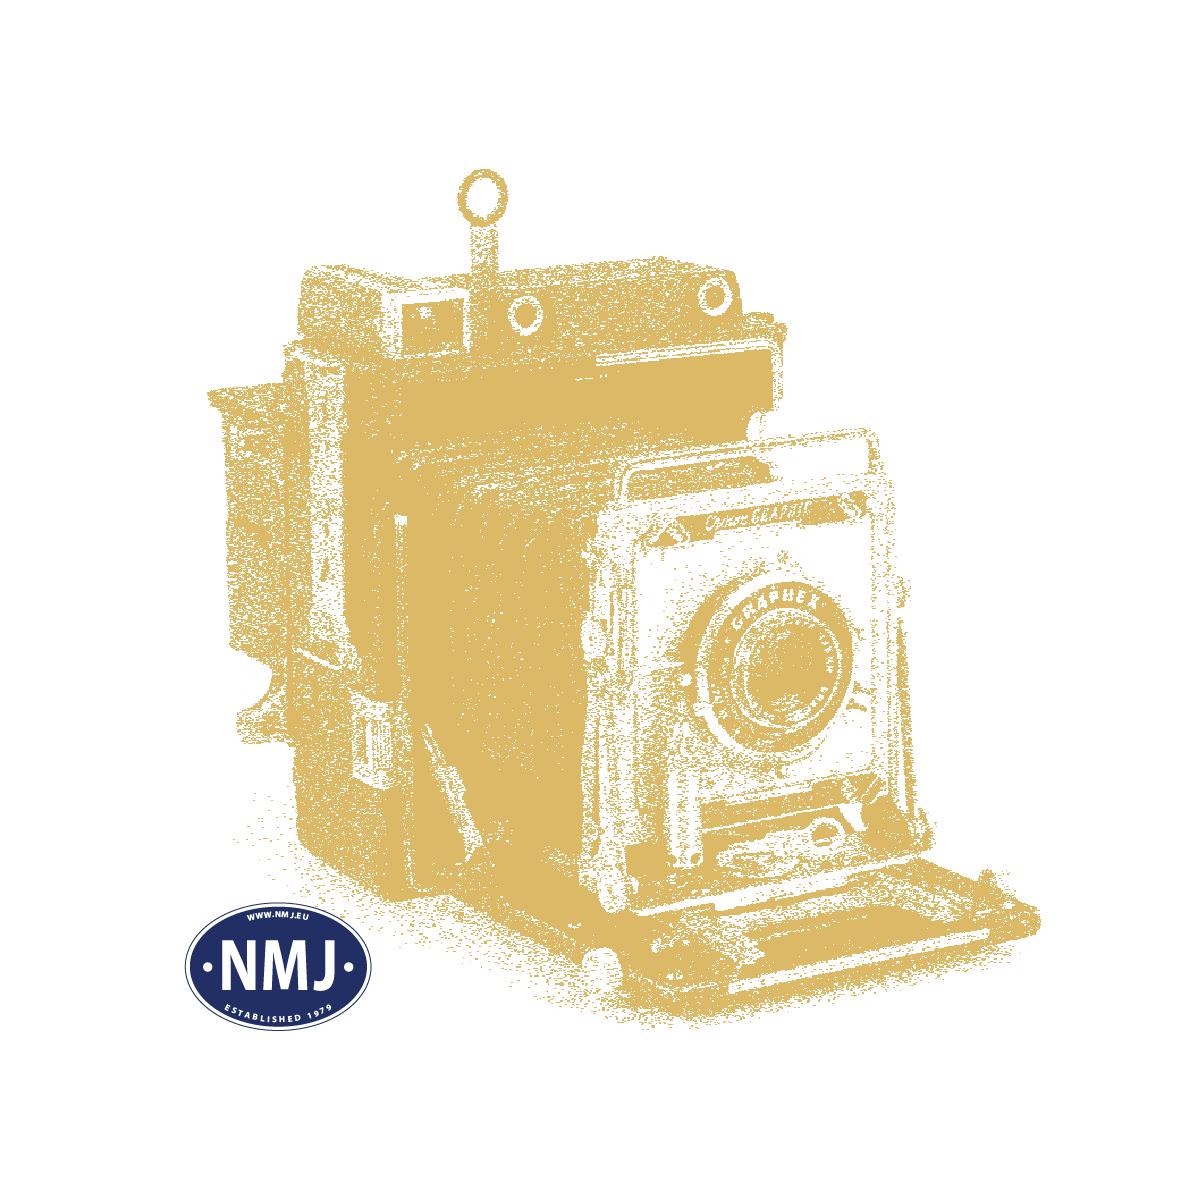 NMJT93101 - NMJ Topline NSB El14 2164, Gammeldesign, DC